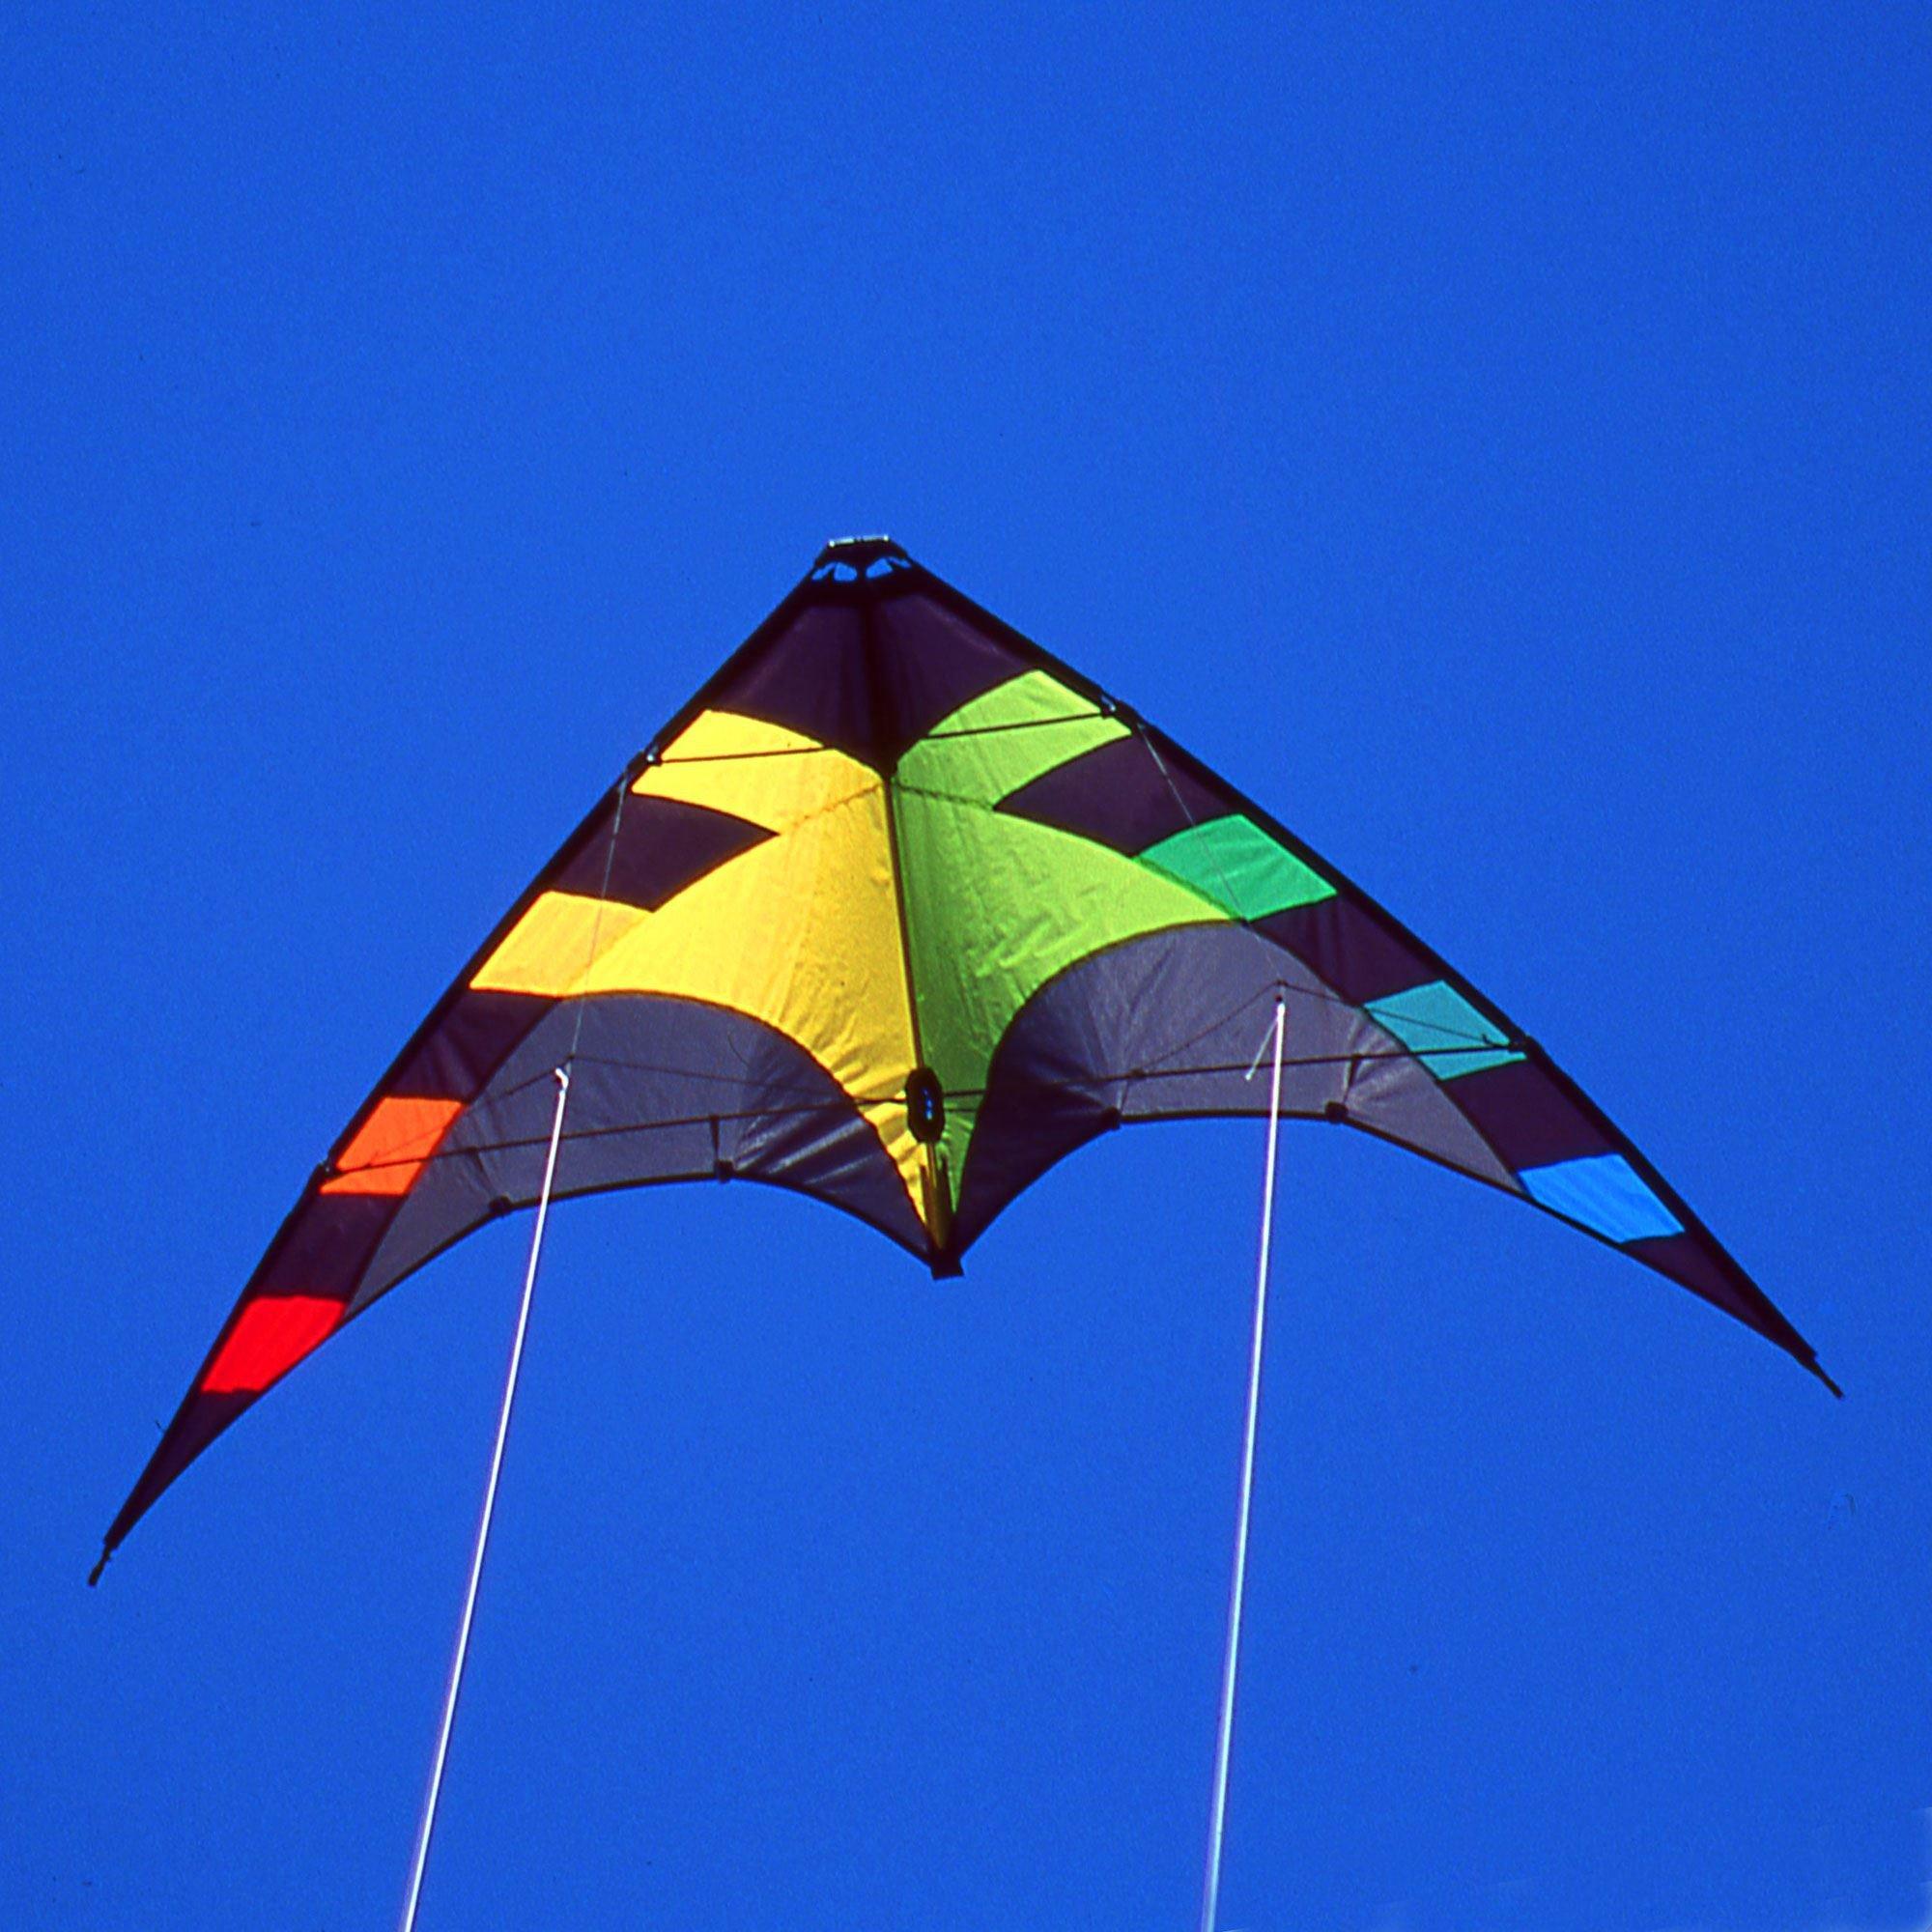 Spider Dual Line Stunt Kite